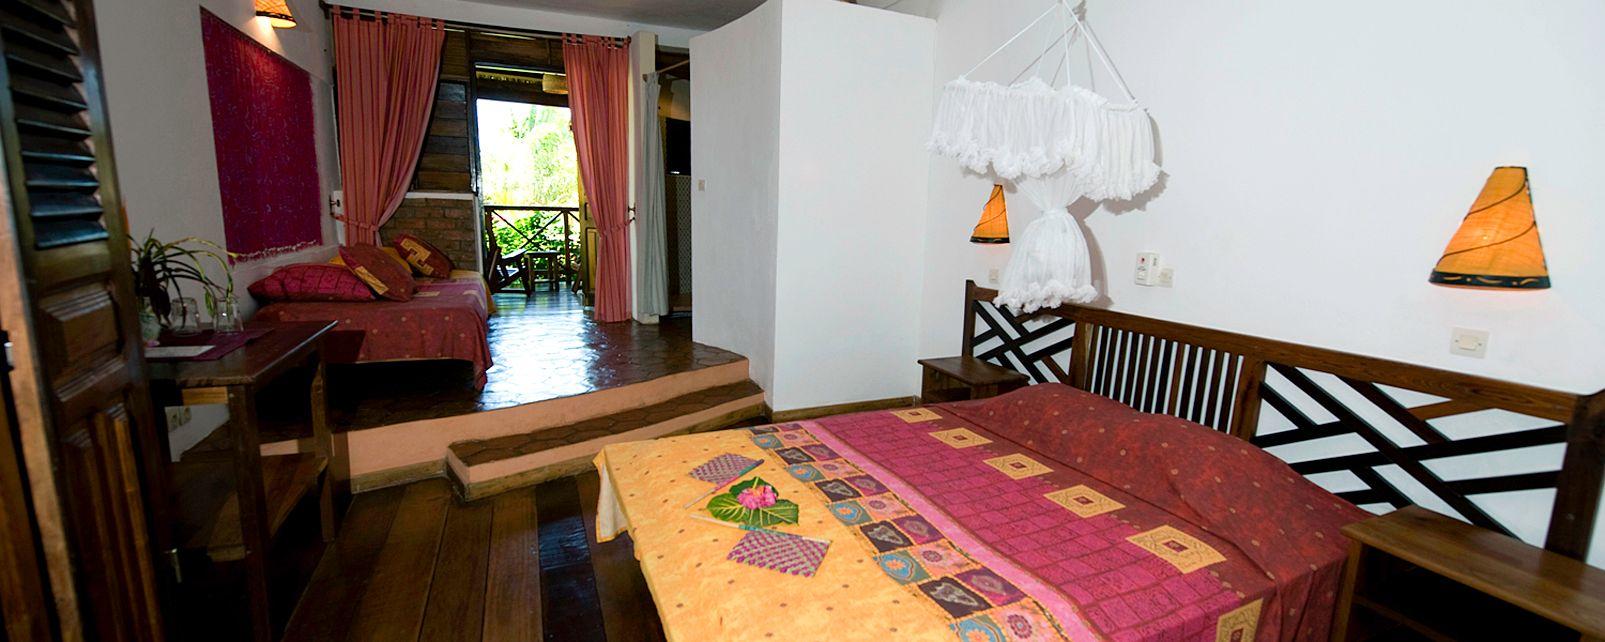 Hotel Sakatia Passion